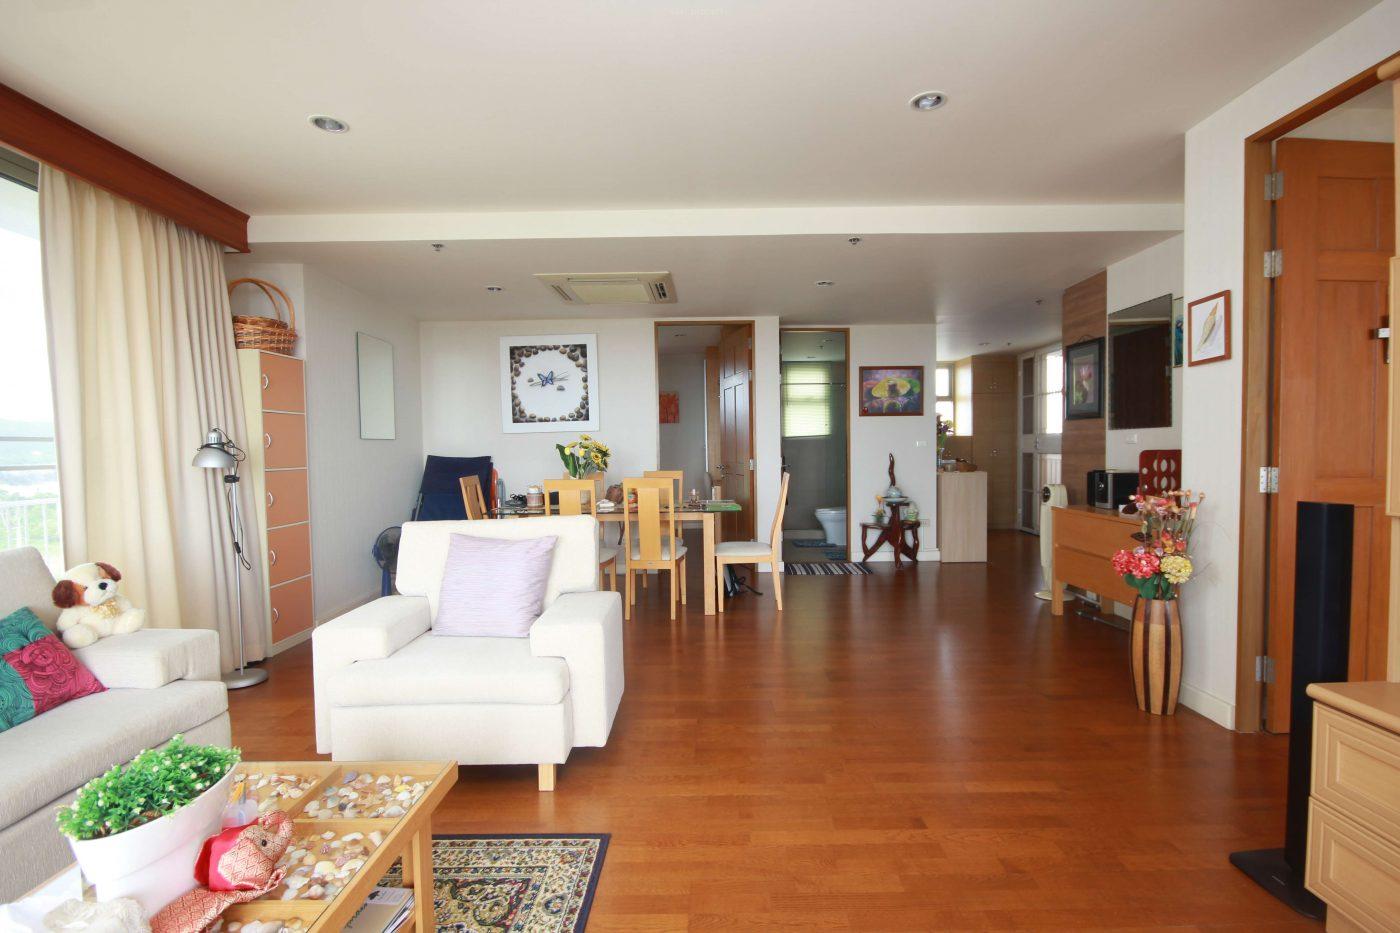 2bedroom villa for sale hua hin